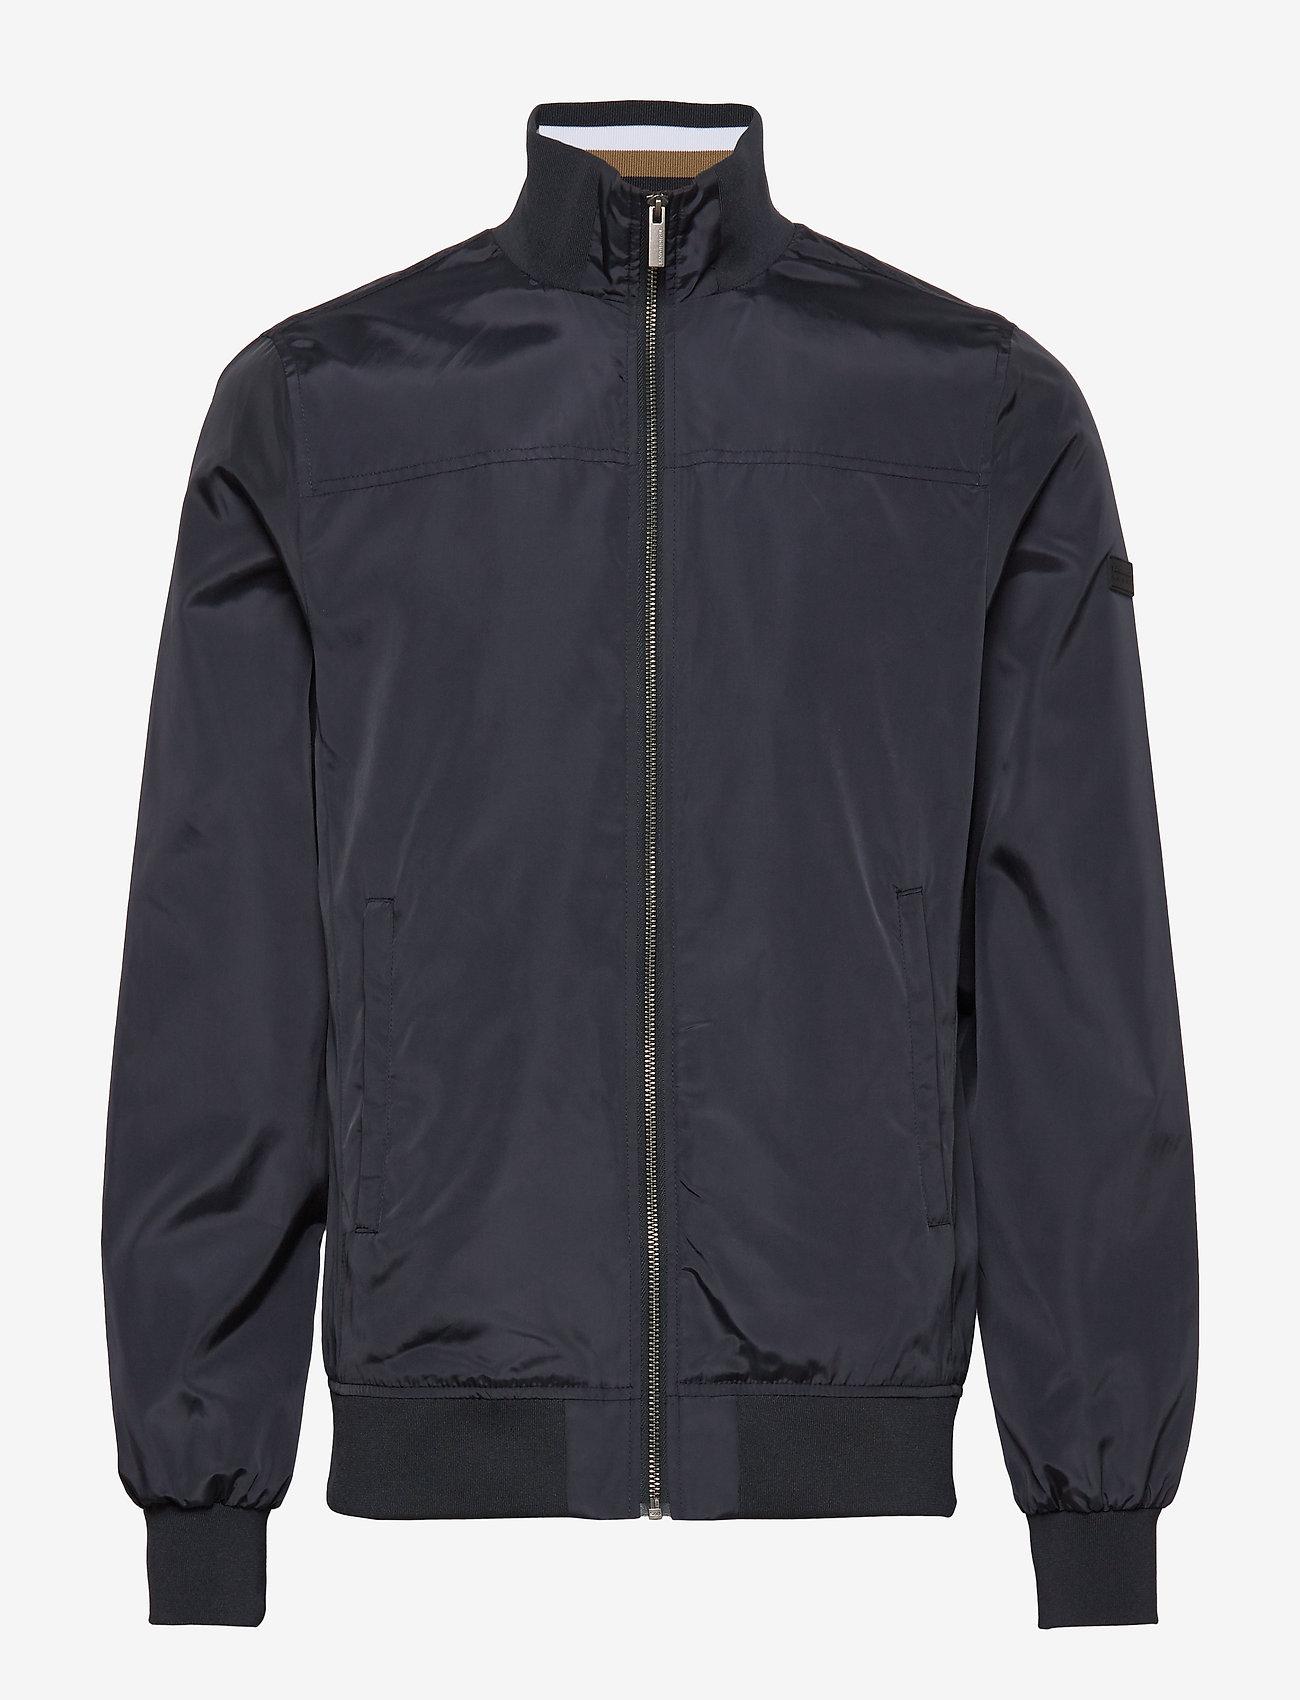 Lindbergh - Soft nylon jacket - kevyet takit - navy - 1